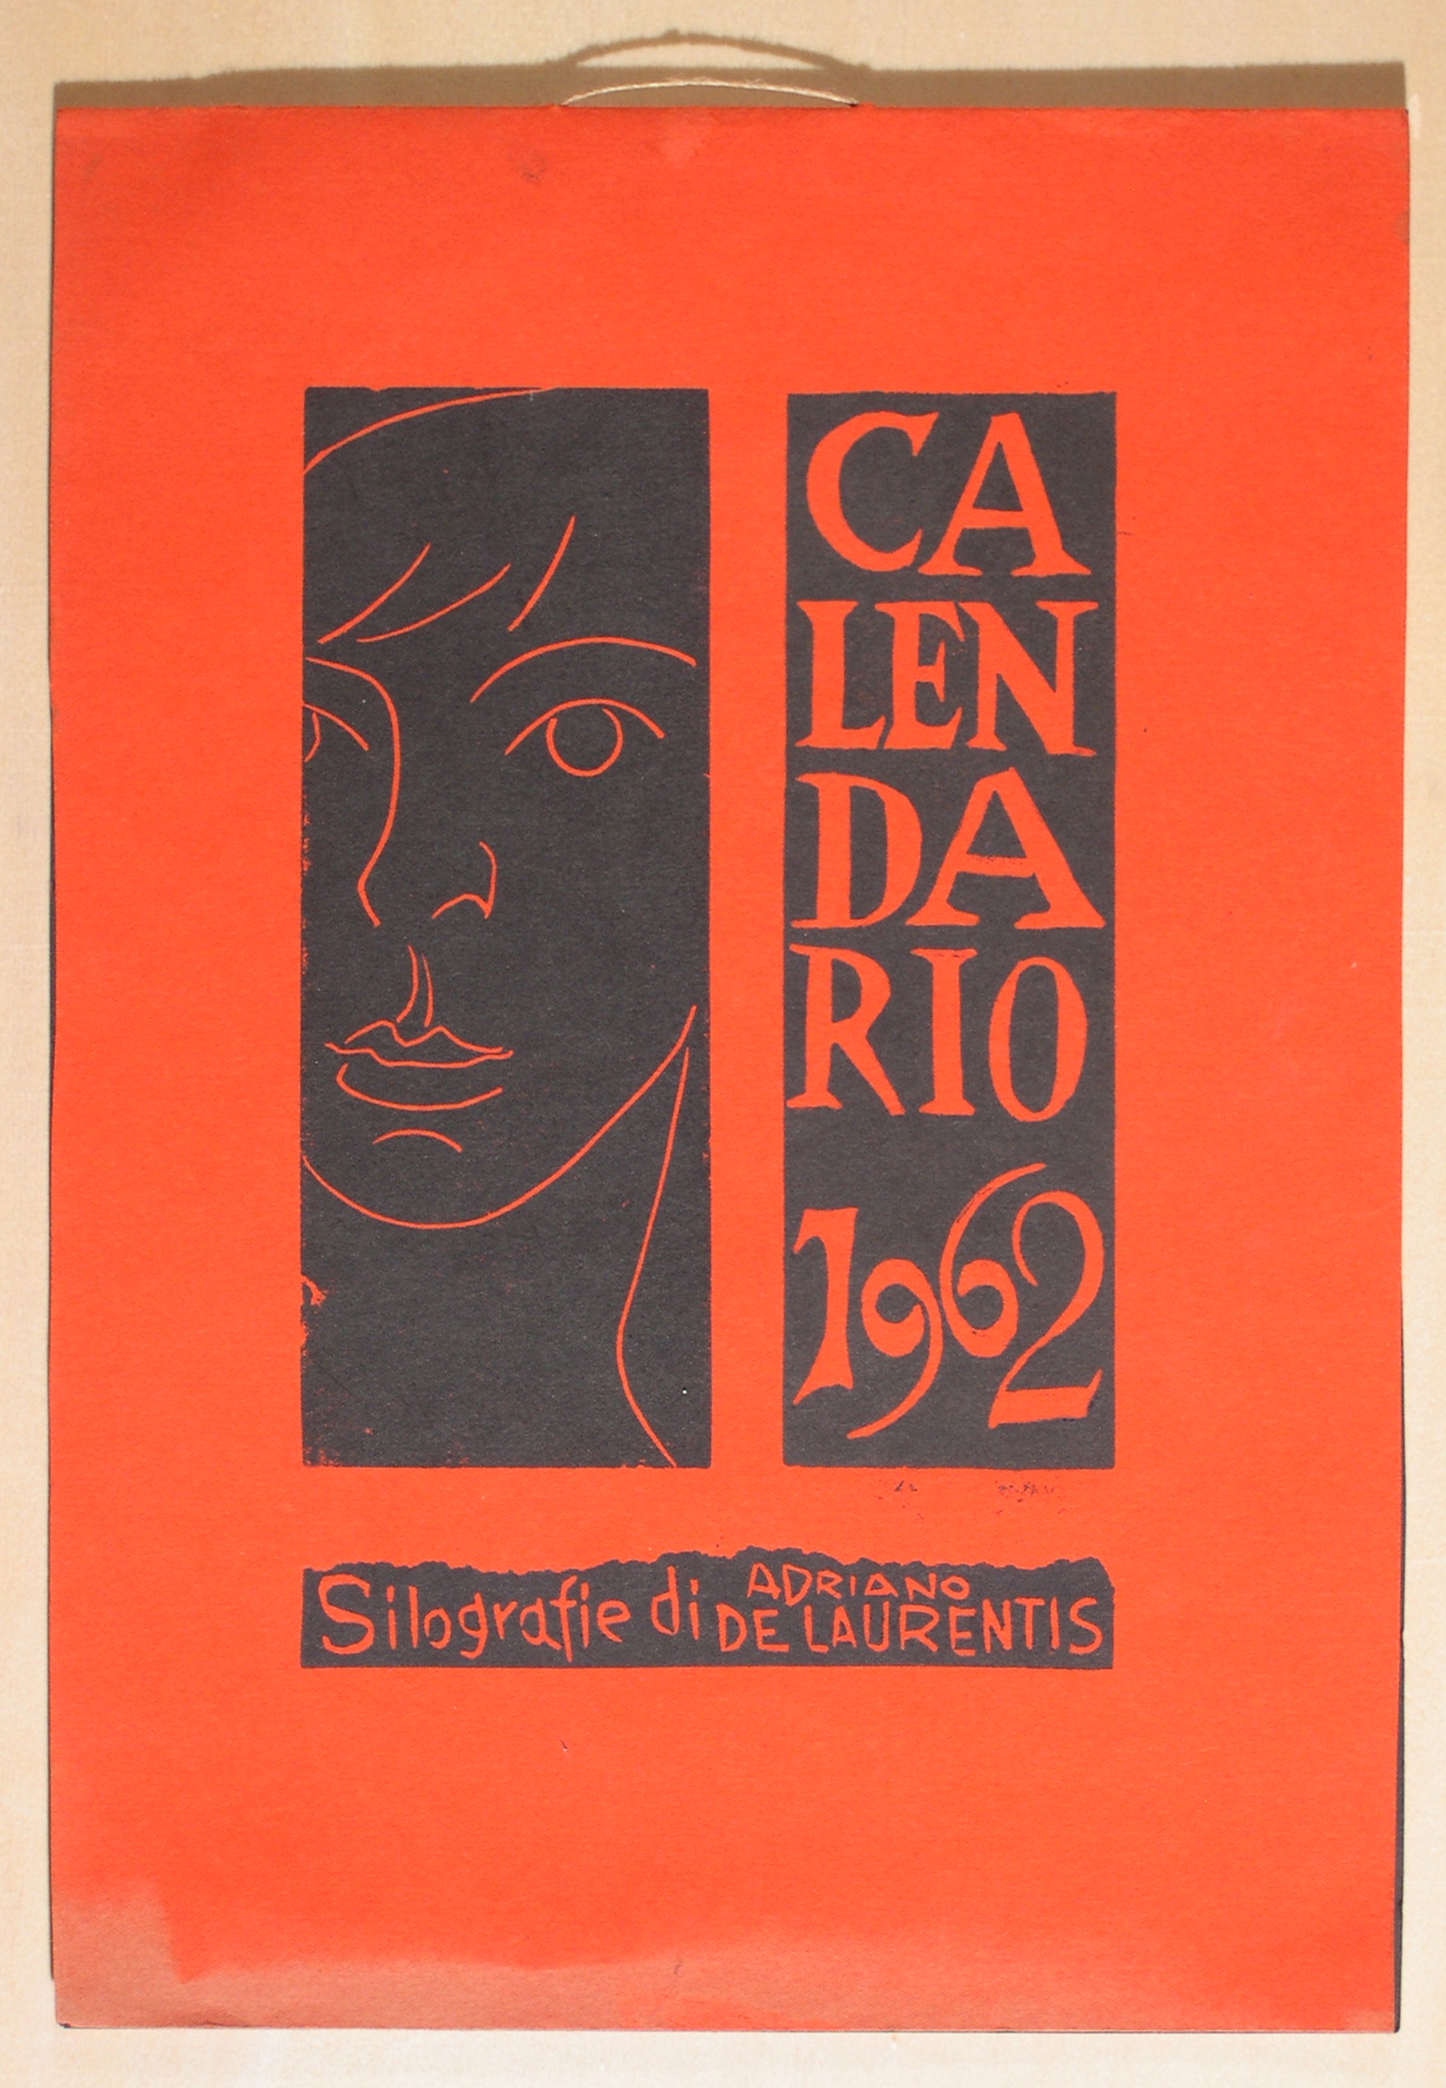 Calendario 1962 copertina - Xilografia su Carta - 35x25 - 1962